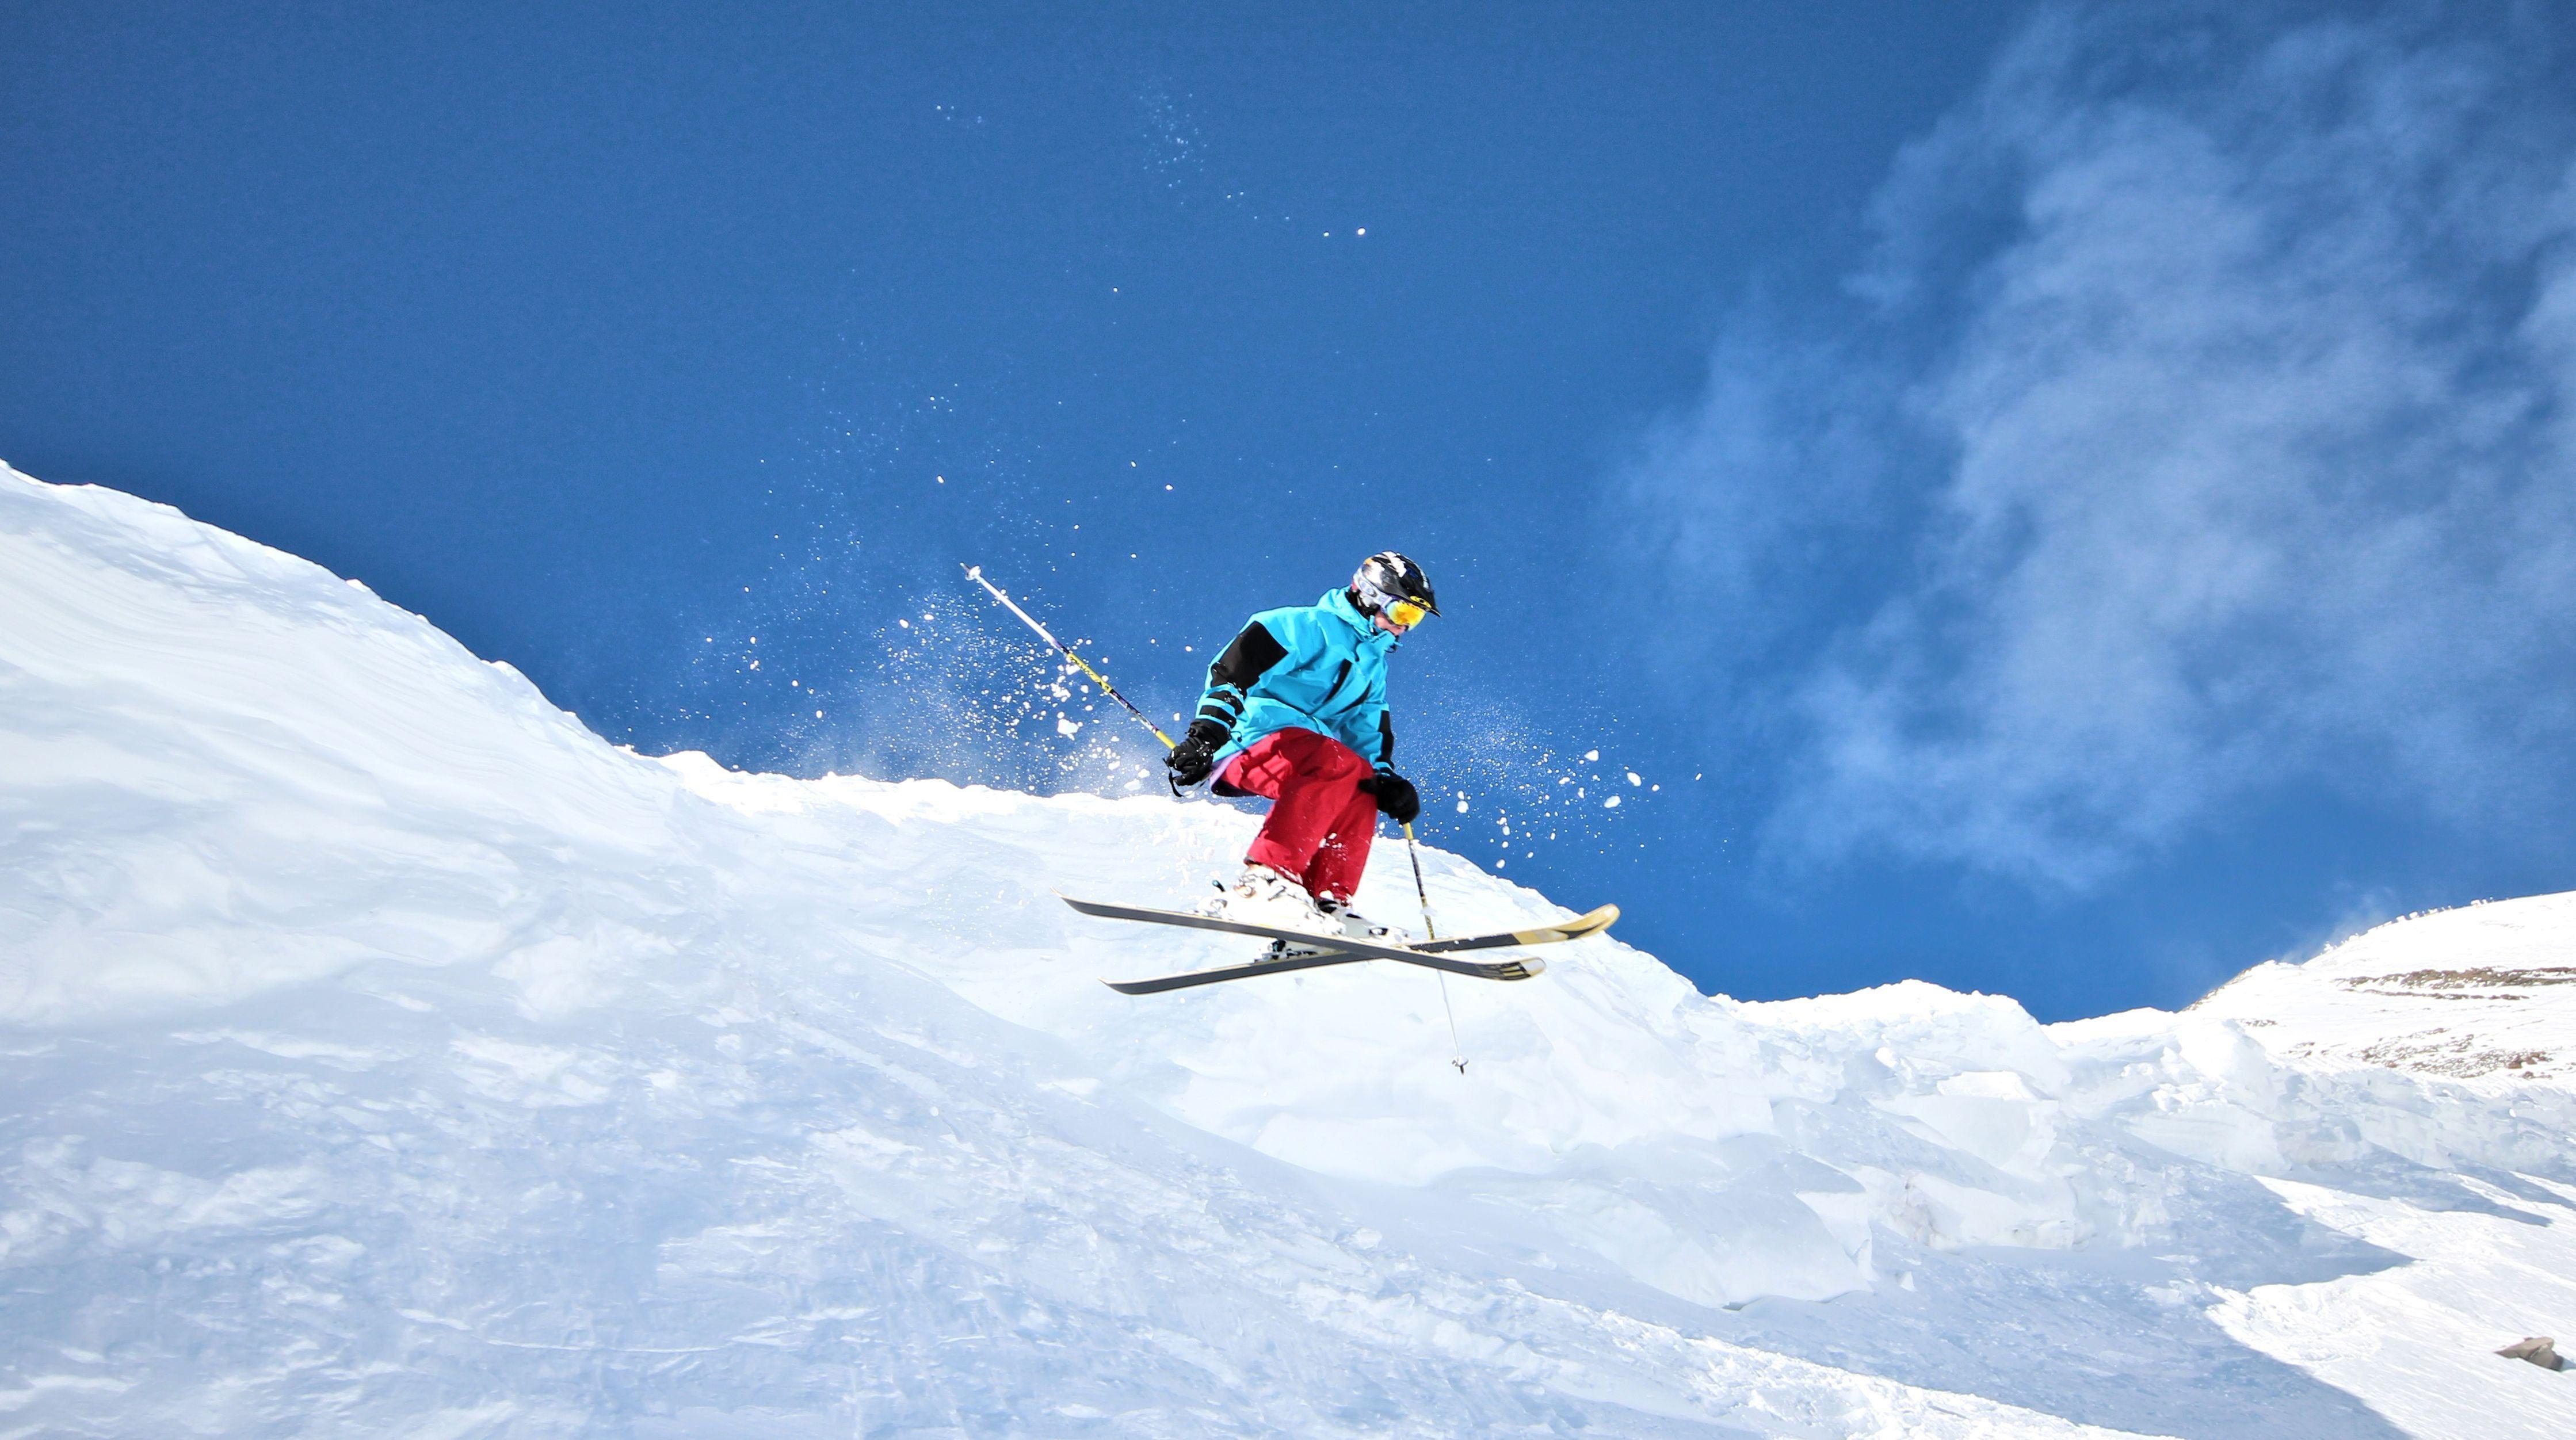 ski wallpapers wallpaperup | hd wallpapers | pinterest | wallpaper